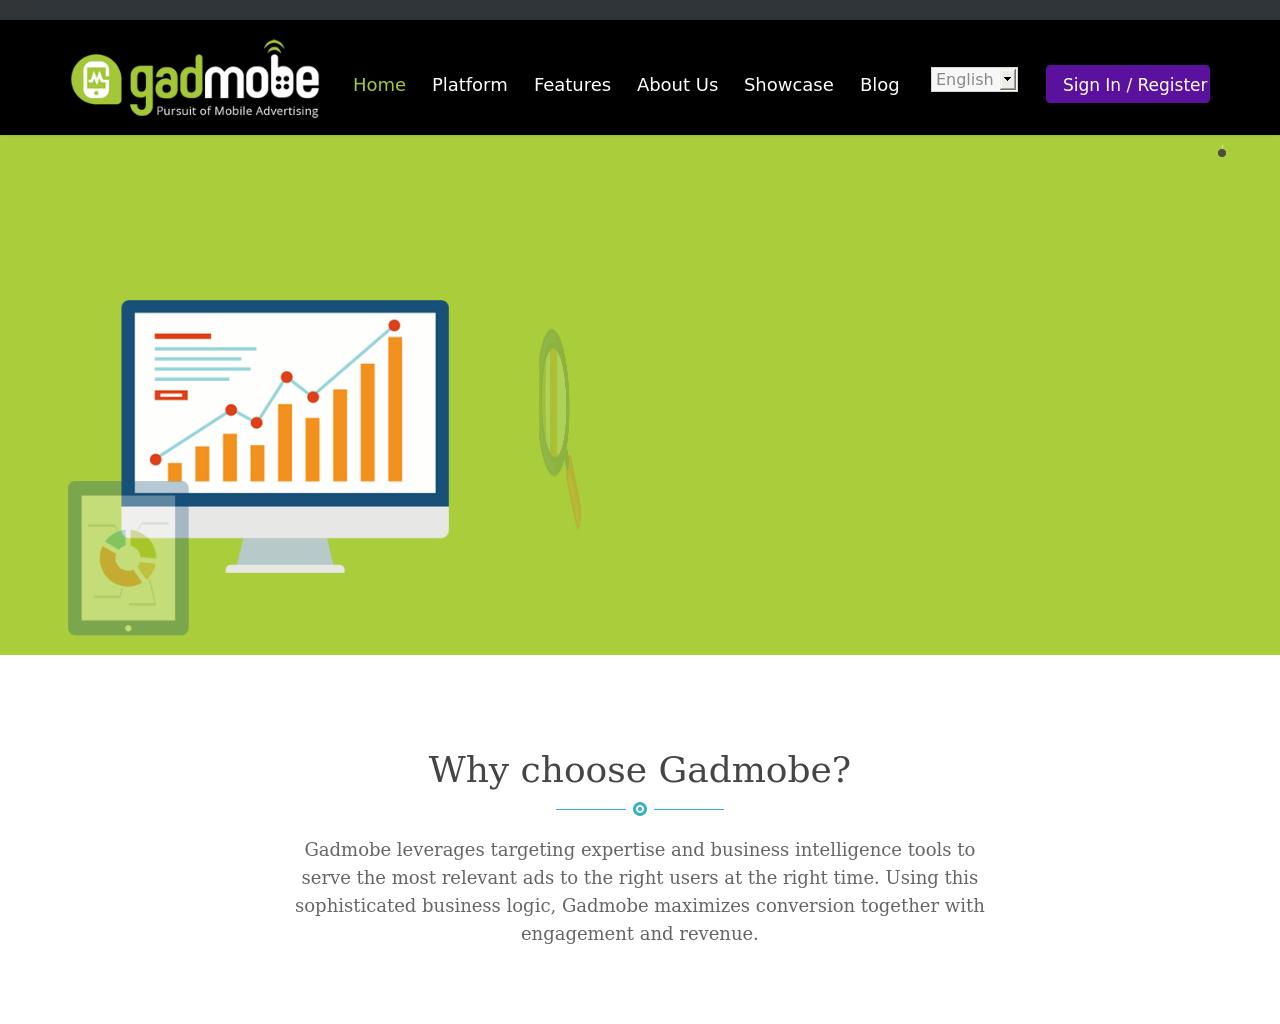 Gadmobe-Advertising-Reviews-Pricing